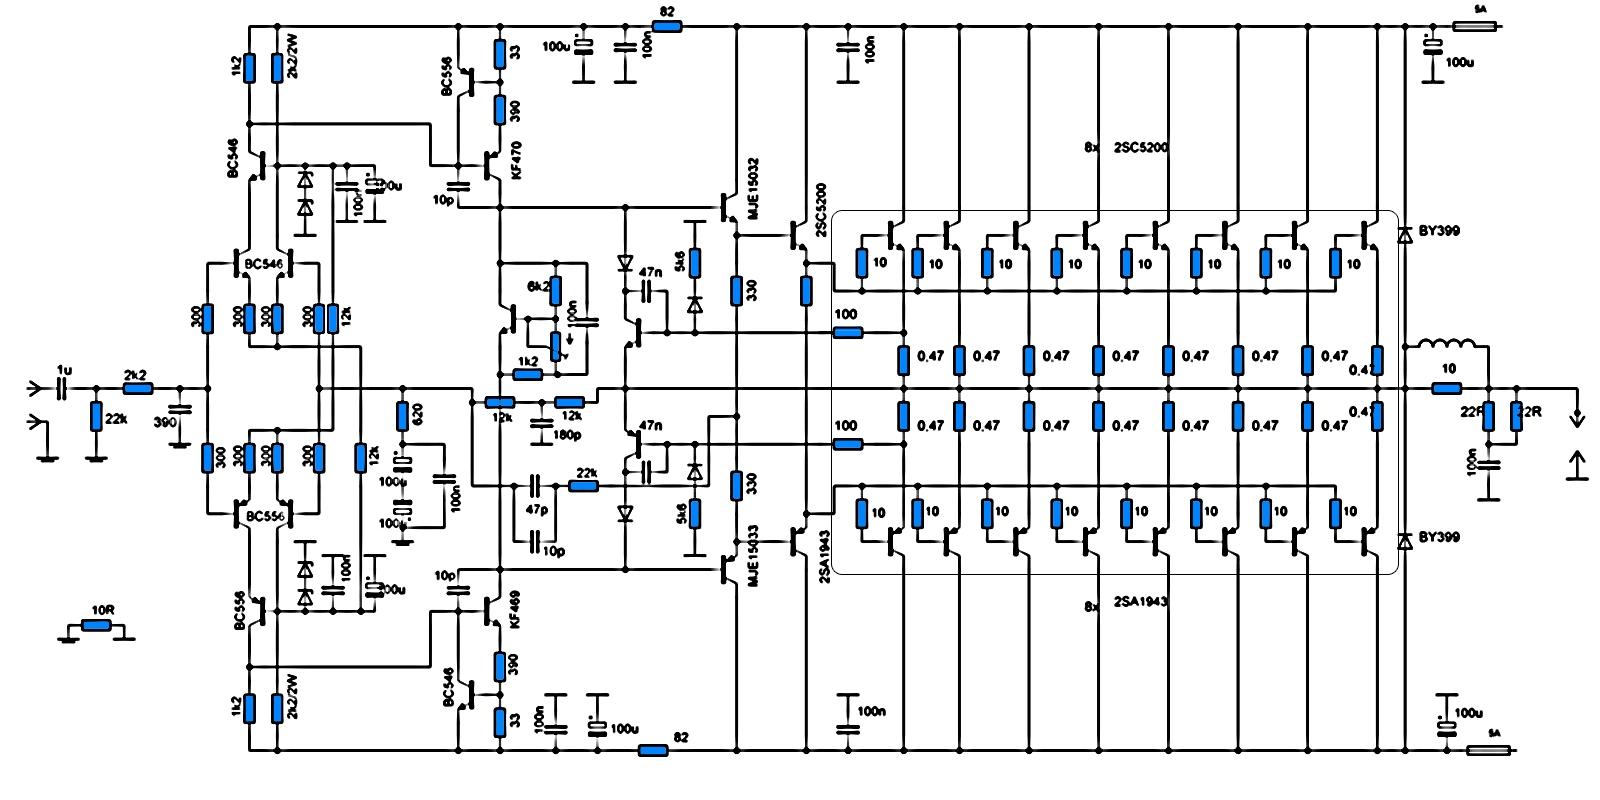 [VT_1669] Power Supply Wiring Diagram Wiring Diagram